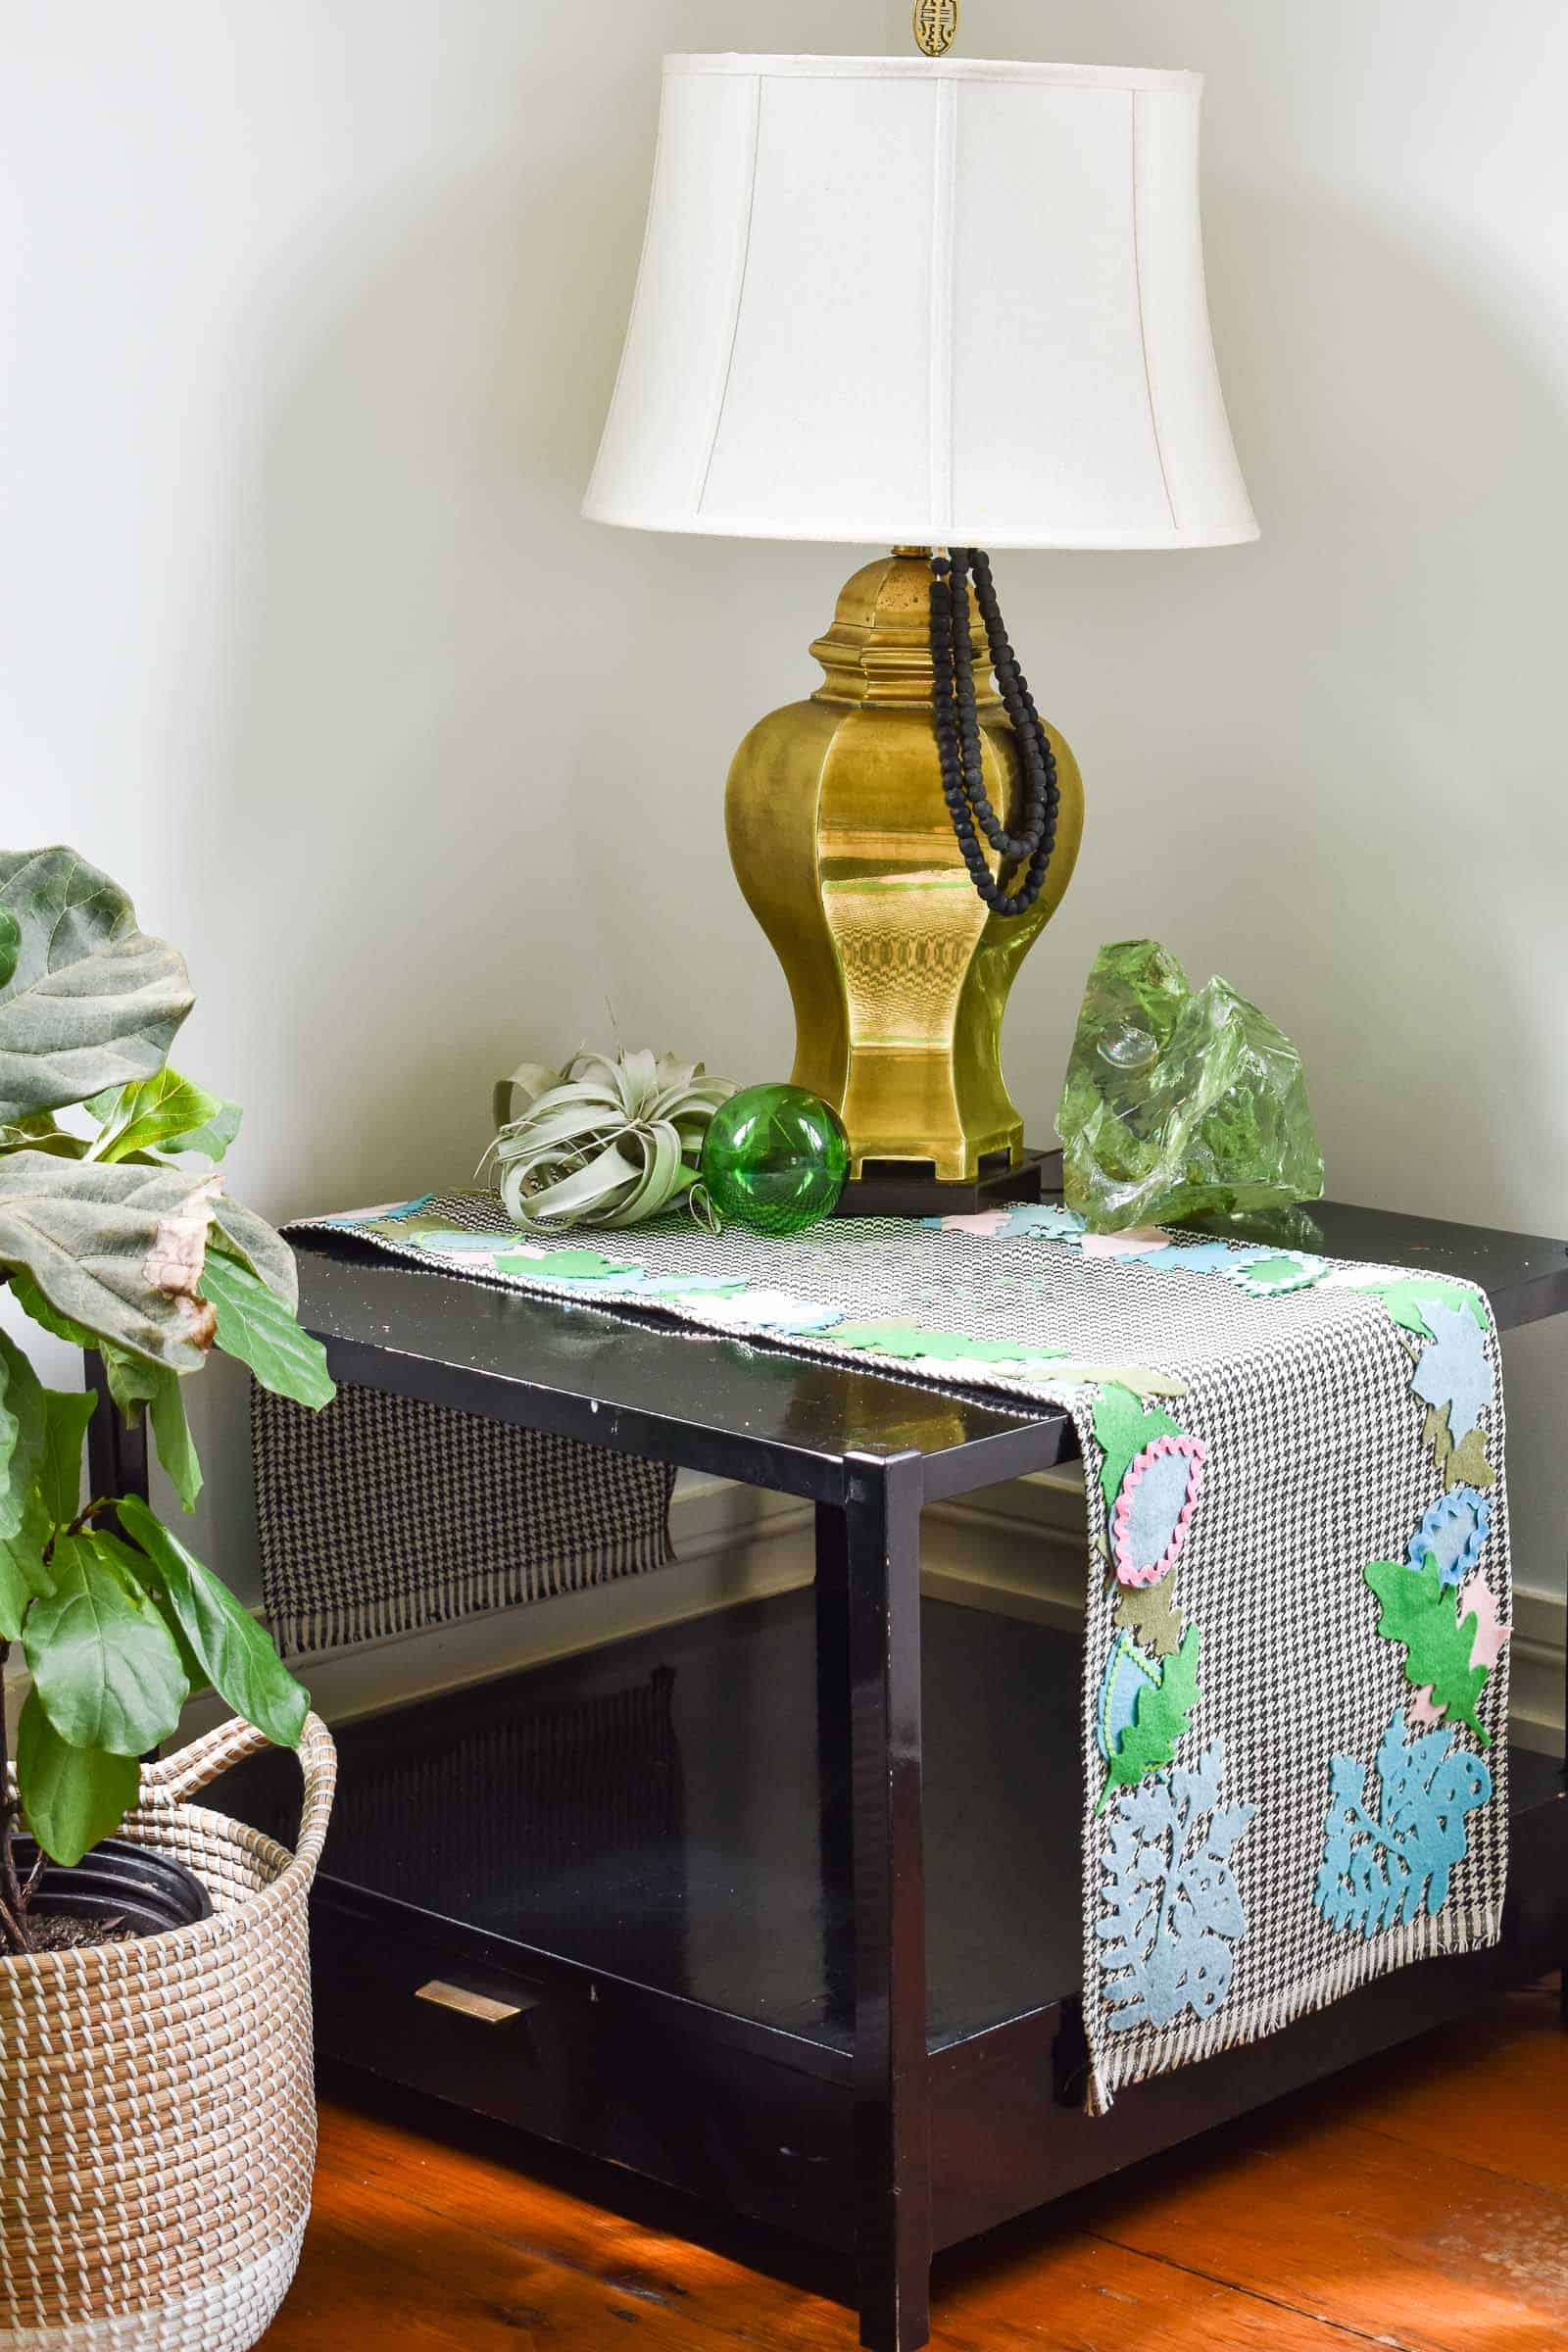 felt fabric table runner with felt leaves